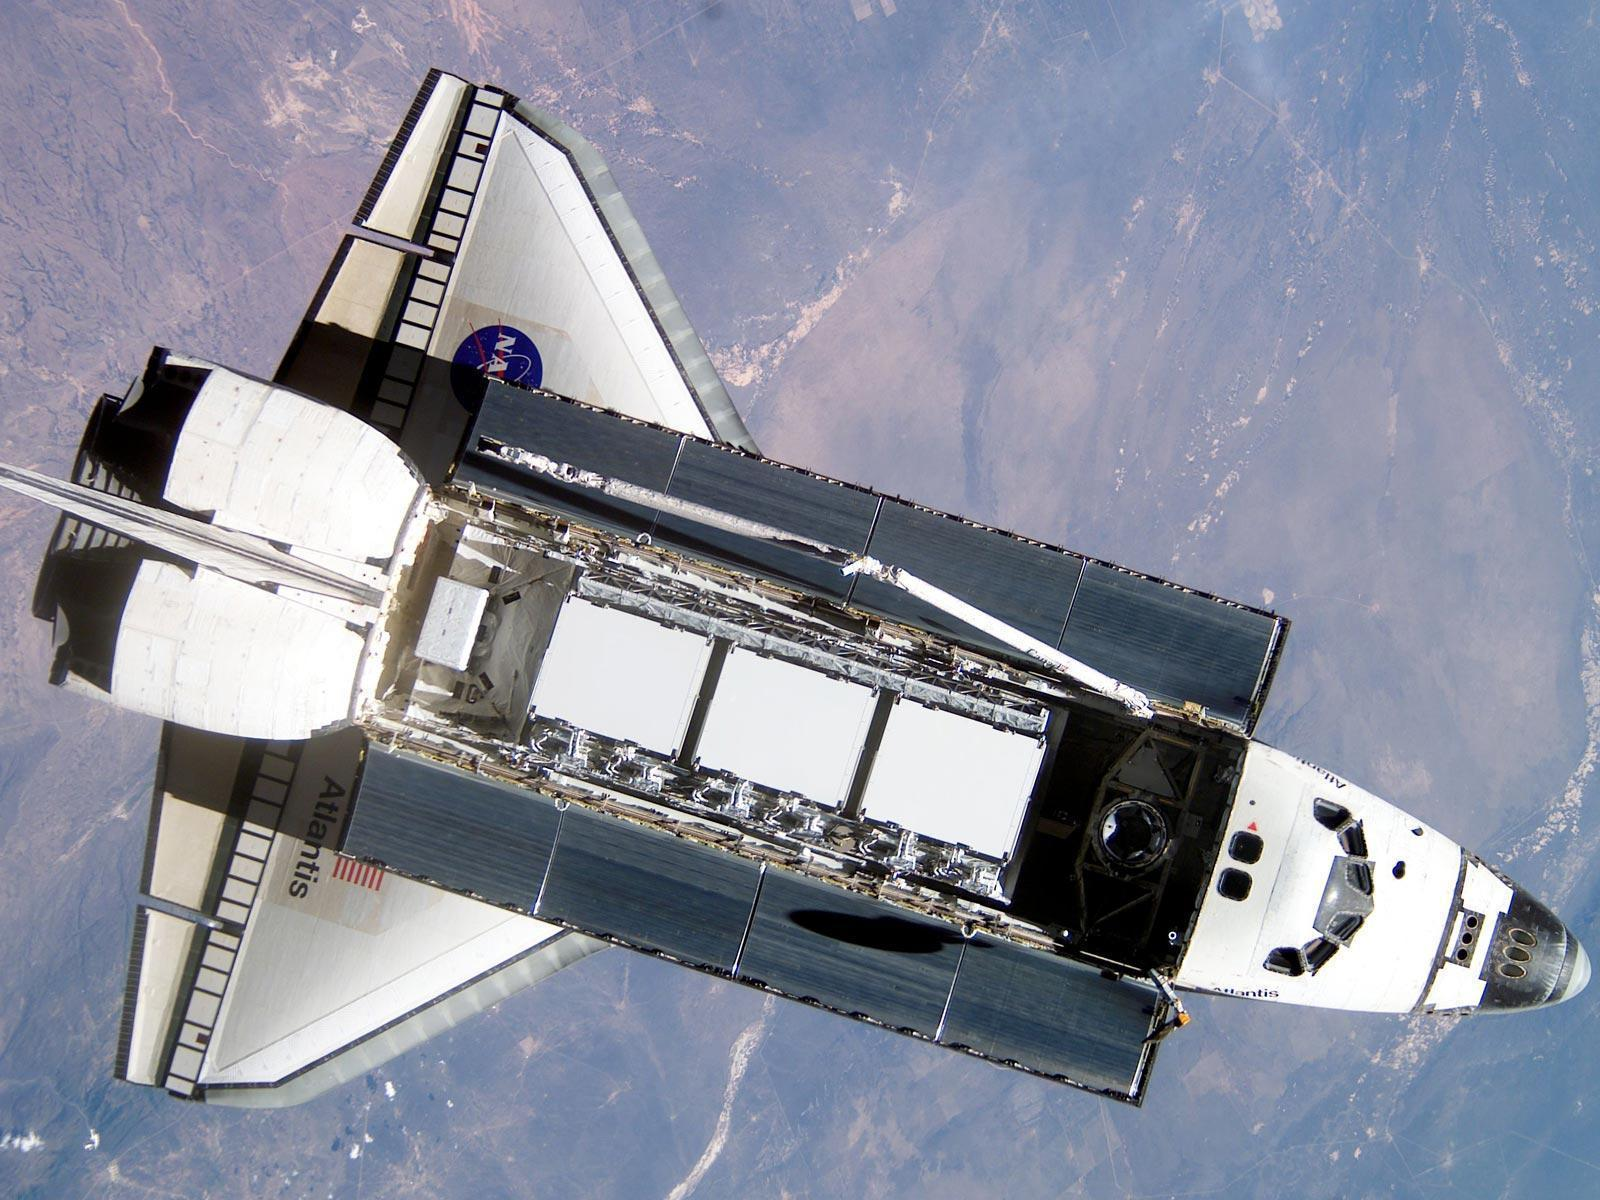 Space Shuttle Desktop Wallpapers - Wallpaper Cave